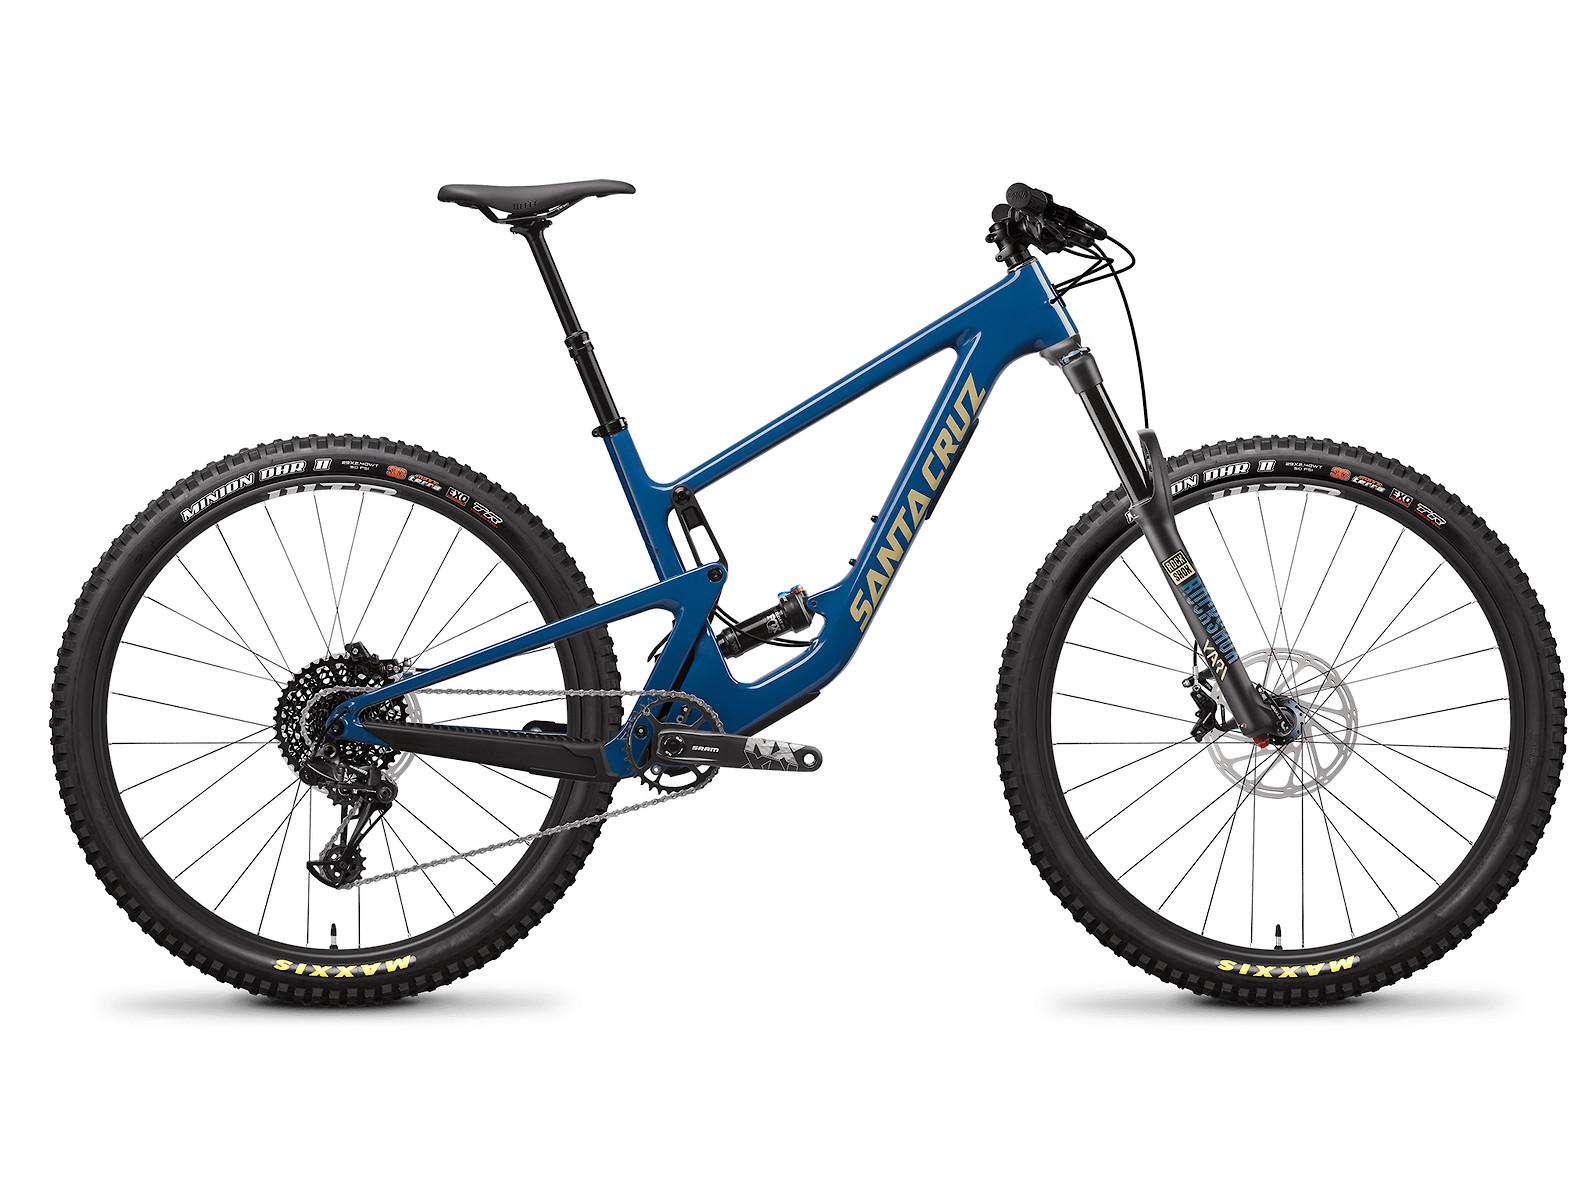 2020 Santa Cruz Hightower Carbon C R - Highland Blue